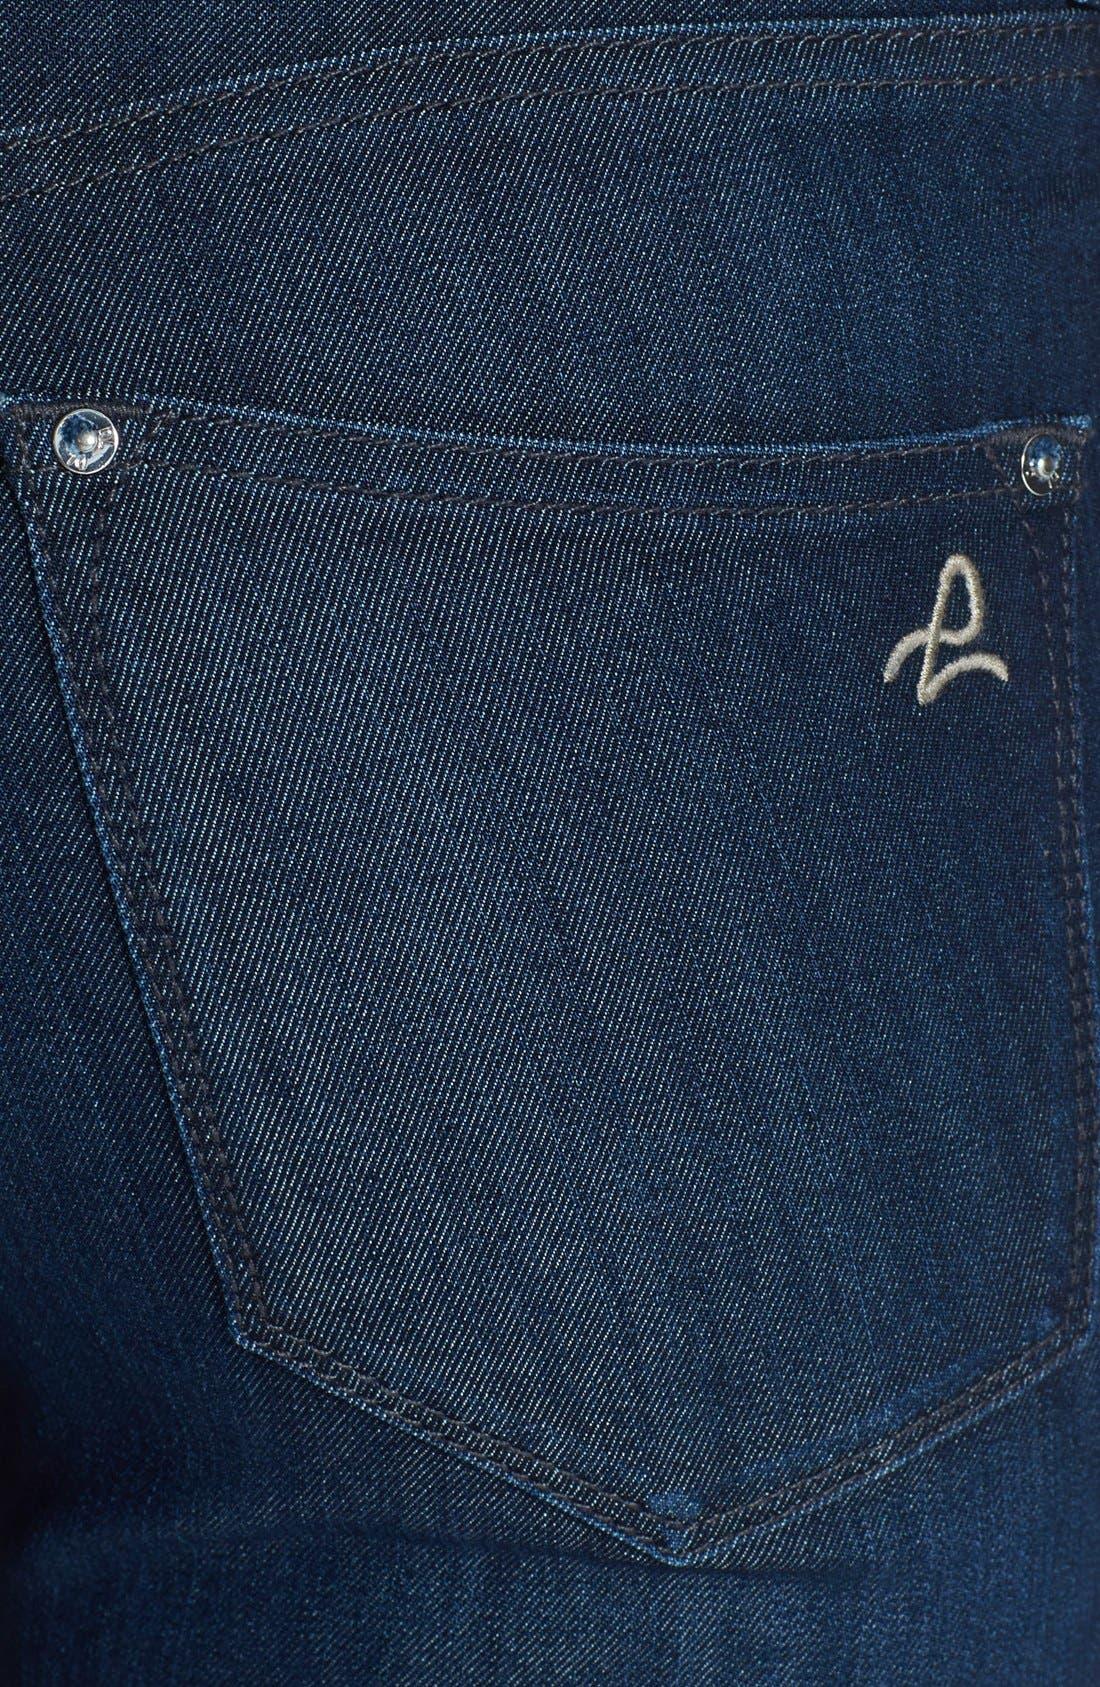 Alternate Image 3  - DL1961 'Nina' High Rise Skinny Jeans (Milan)